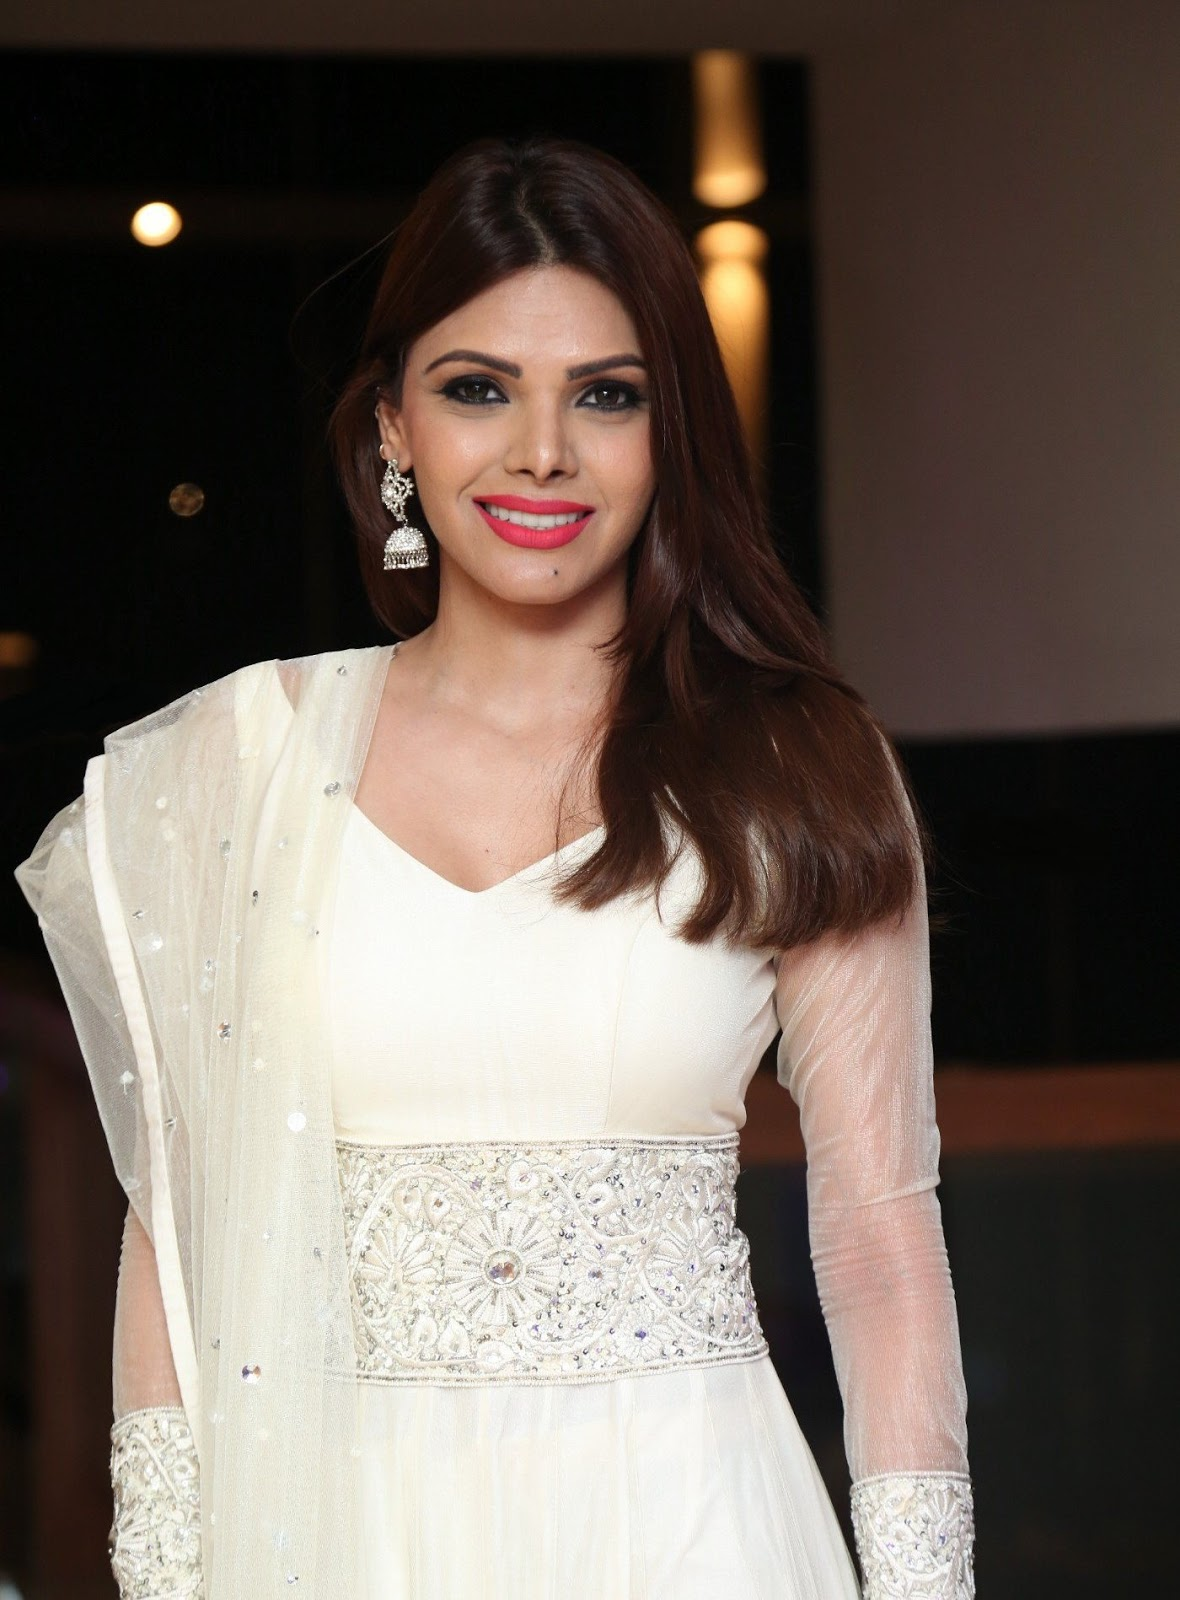 Sherlyn Chopra Looks Super Hot In White Dress At Dj Inayah -4364